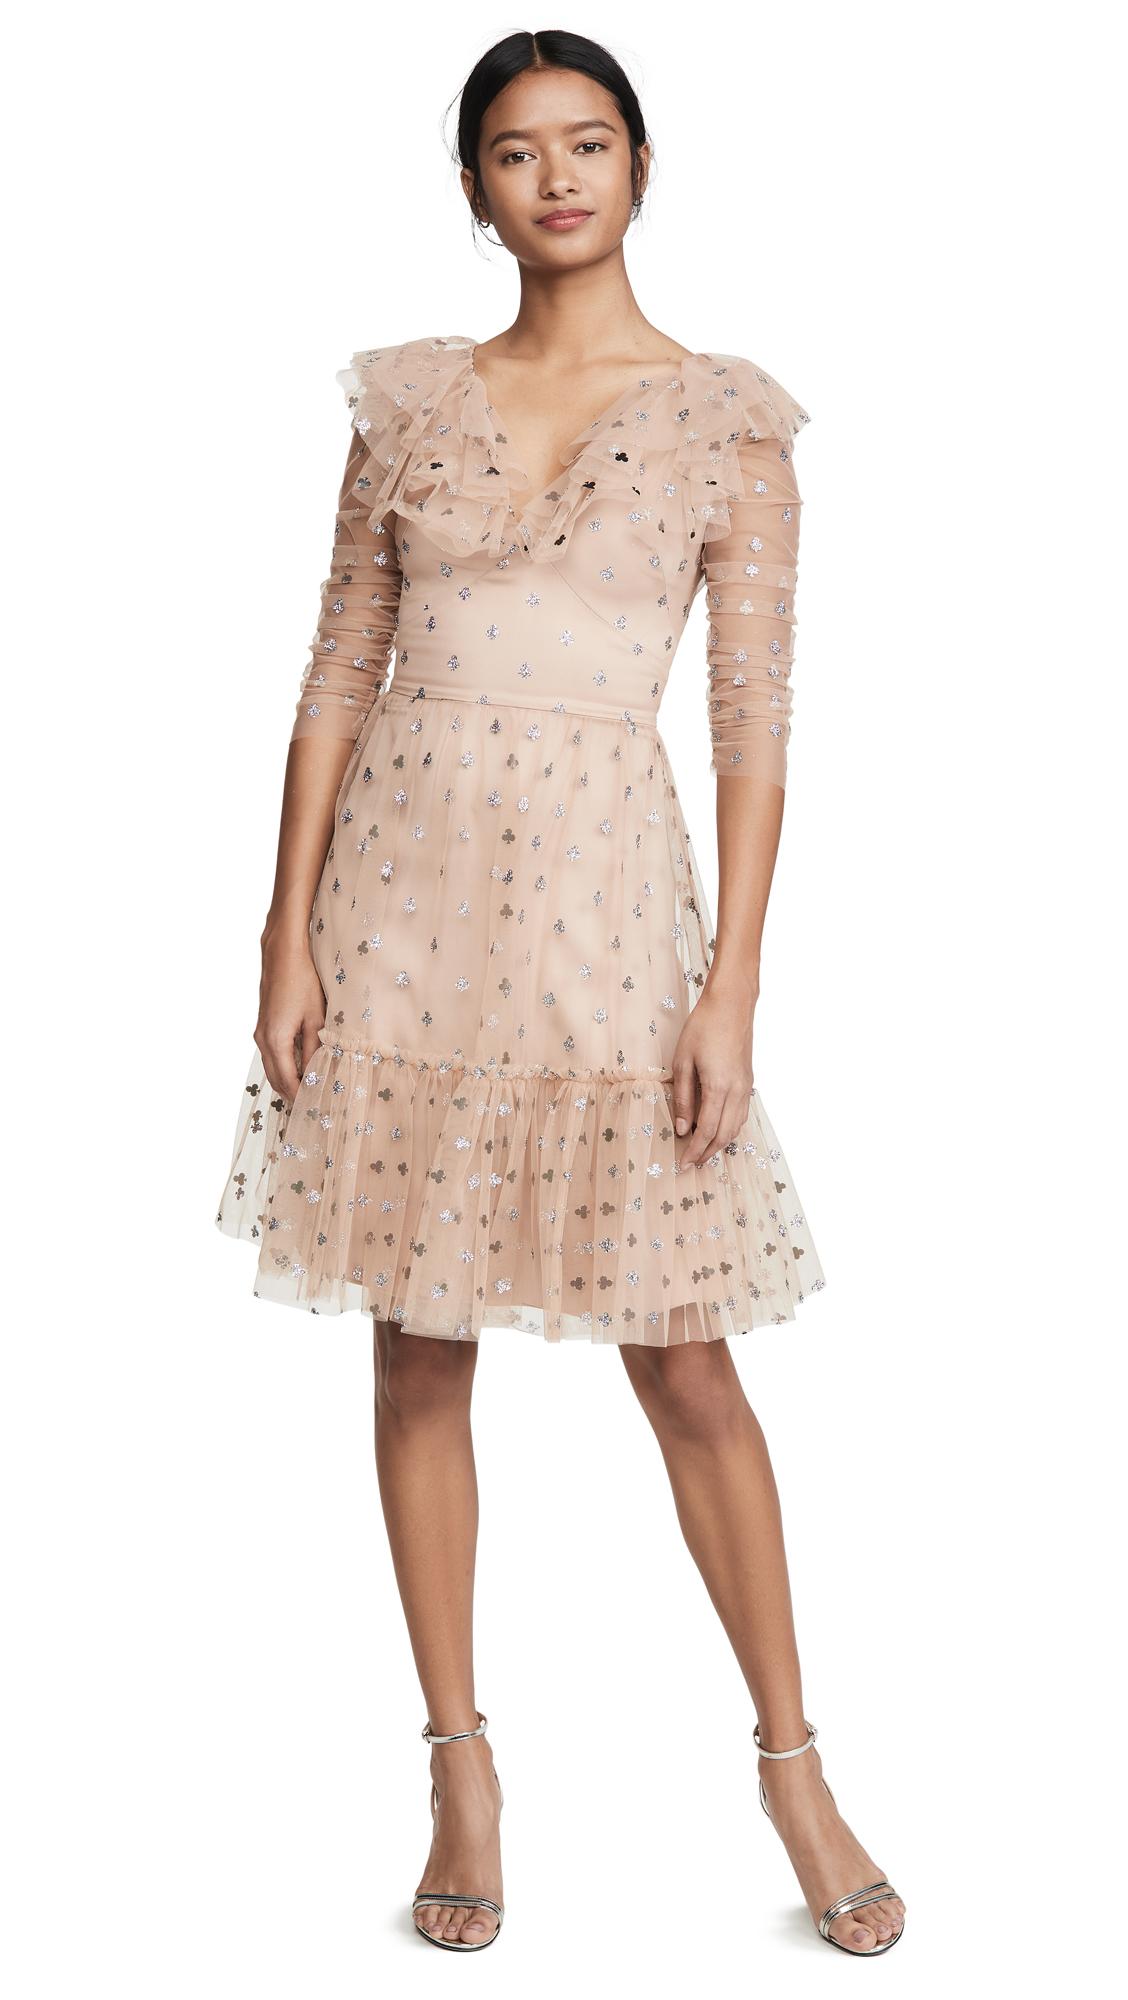 Temperley London Fortuna Short Dress – 60% Off Sale